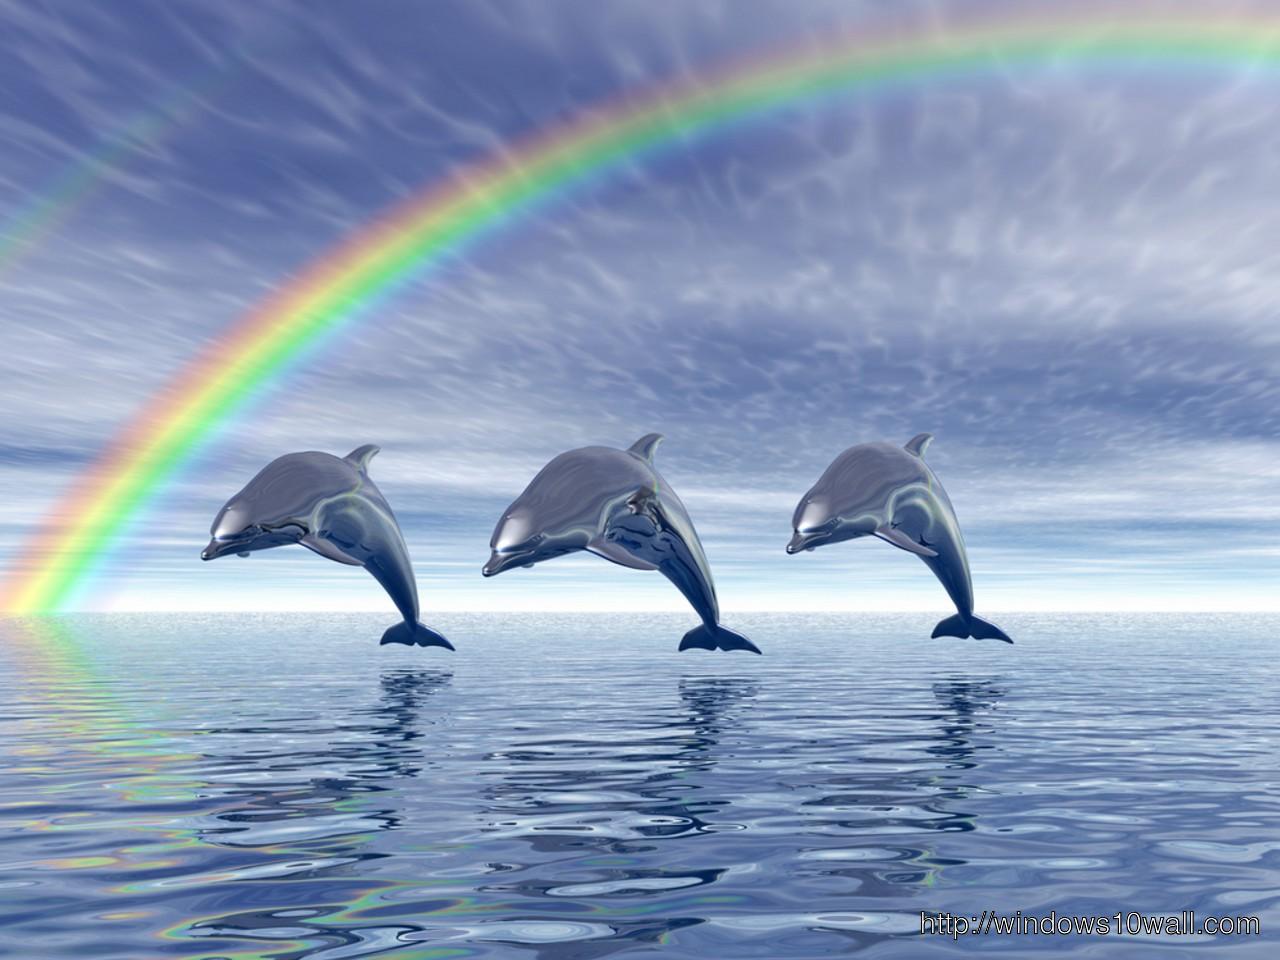 windows 1 0 wallpaper dolphin - photo #39